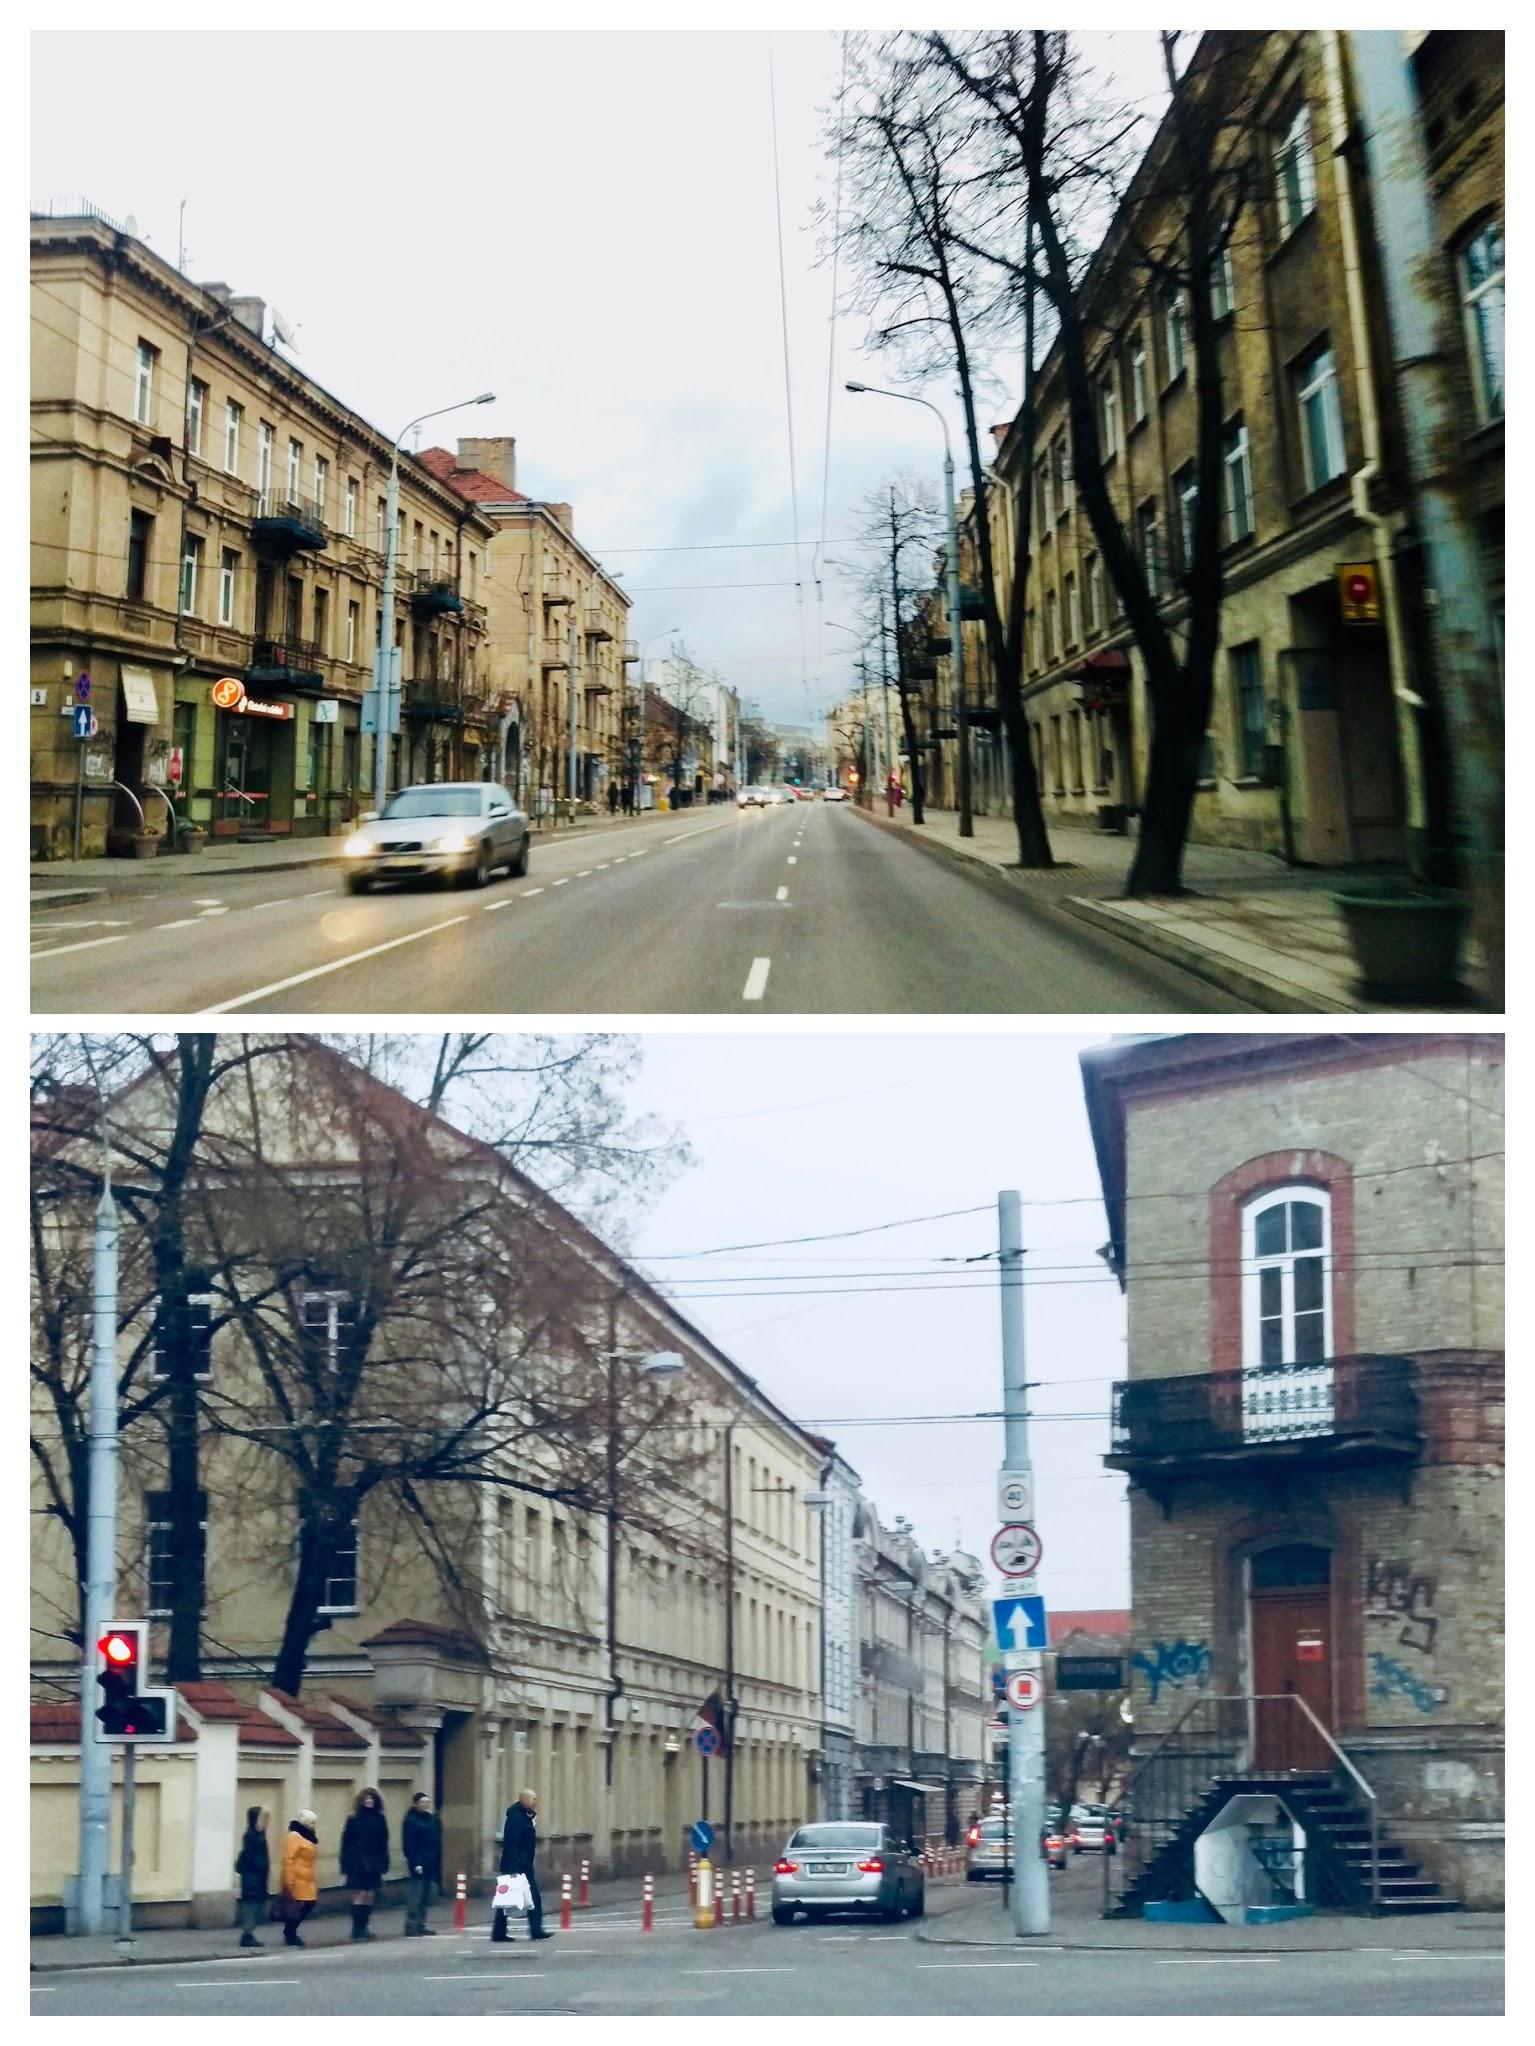 Entering the Center neighborhood and Old Town neighborhood in Vilnius